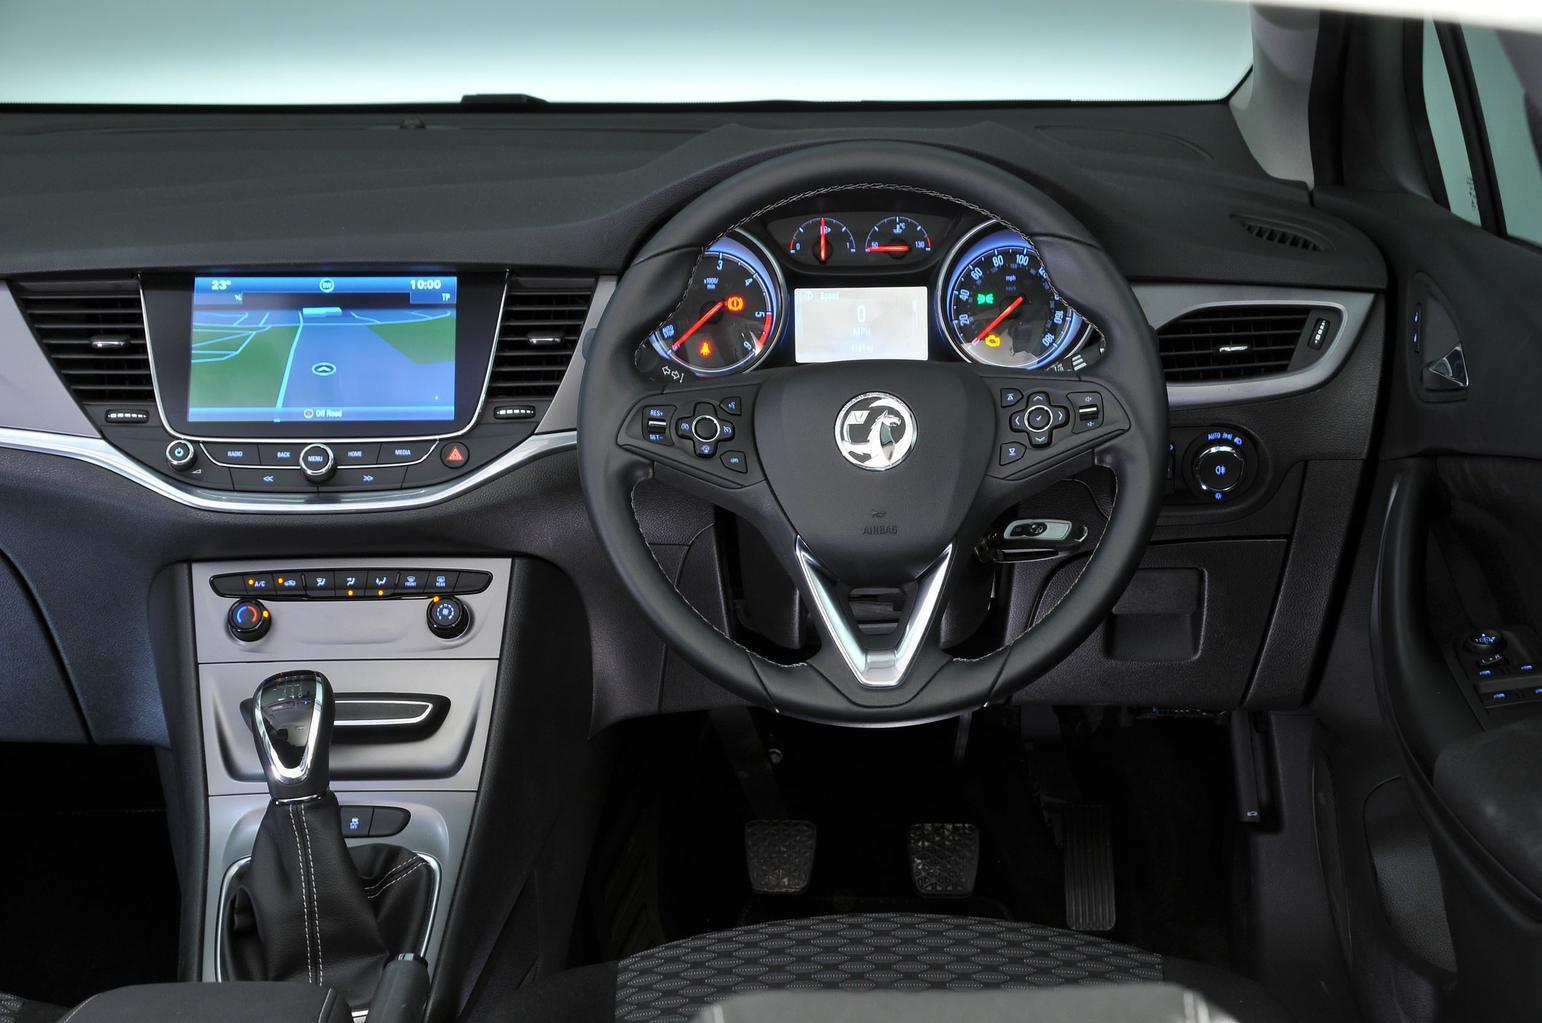 1: Vauxhall Astra 1.6 CDTi 110 Ecoflex - interior